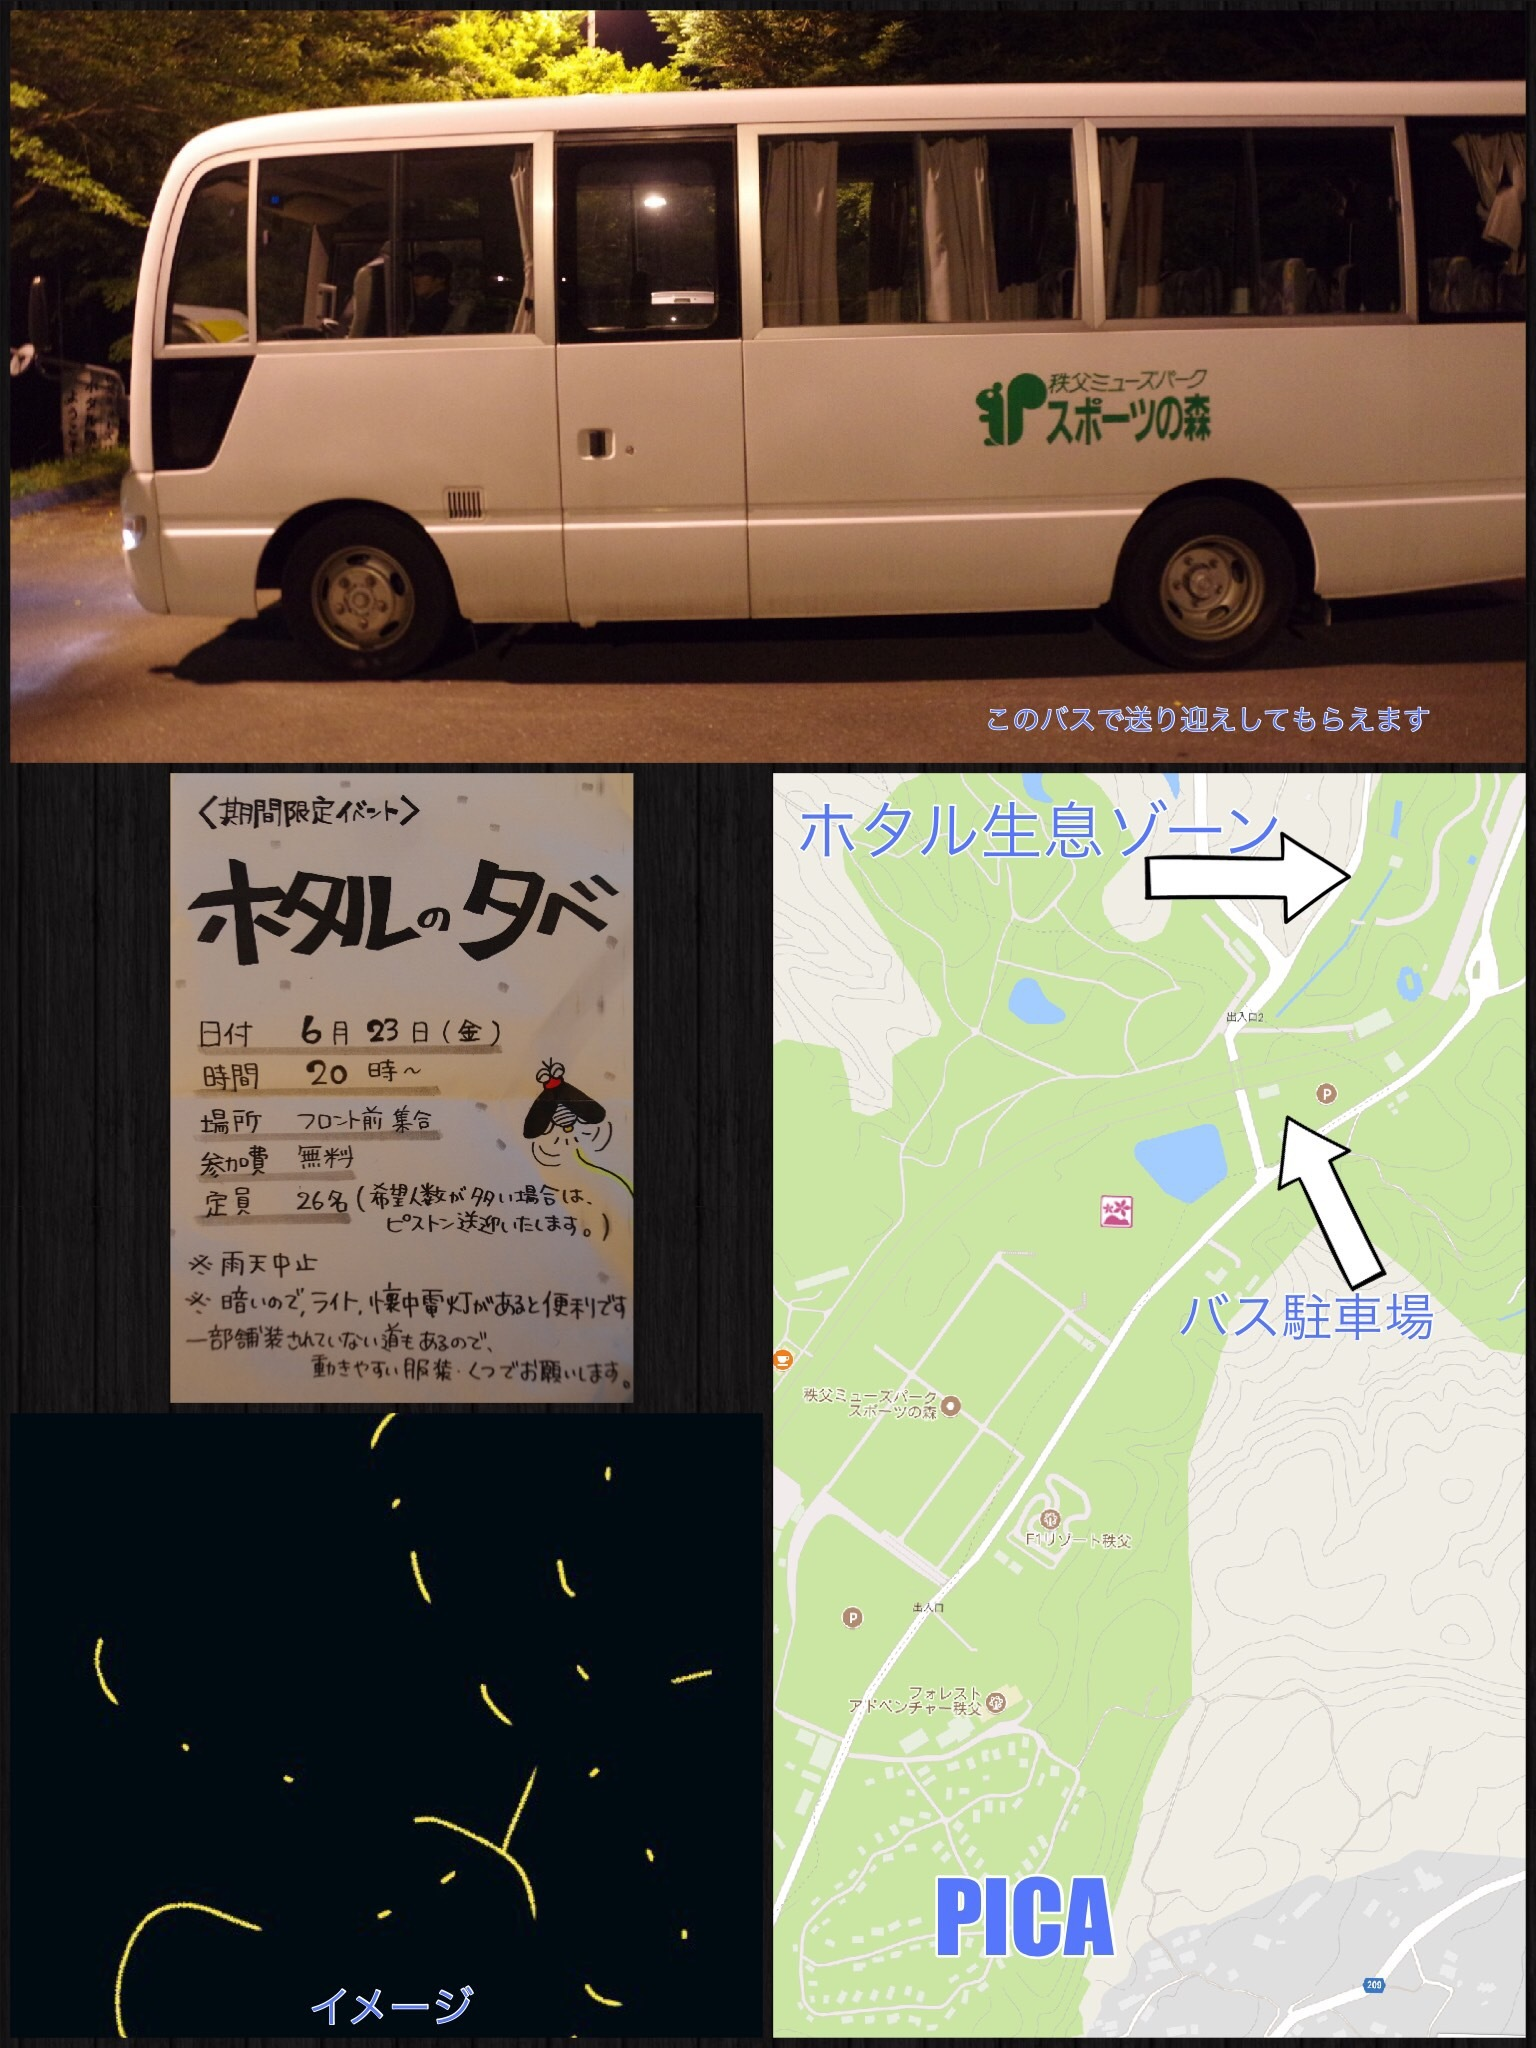 「PICA秩父グランオーベルジュコテージ」宿泊記 ホタル鑑賞